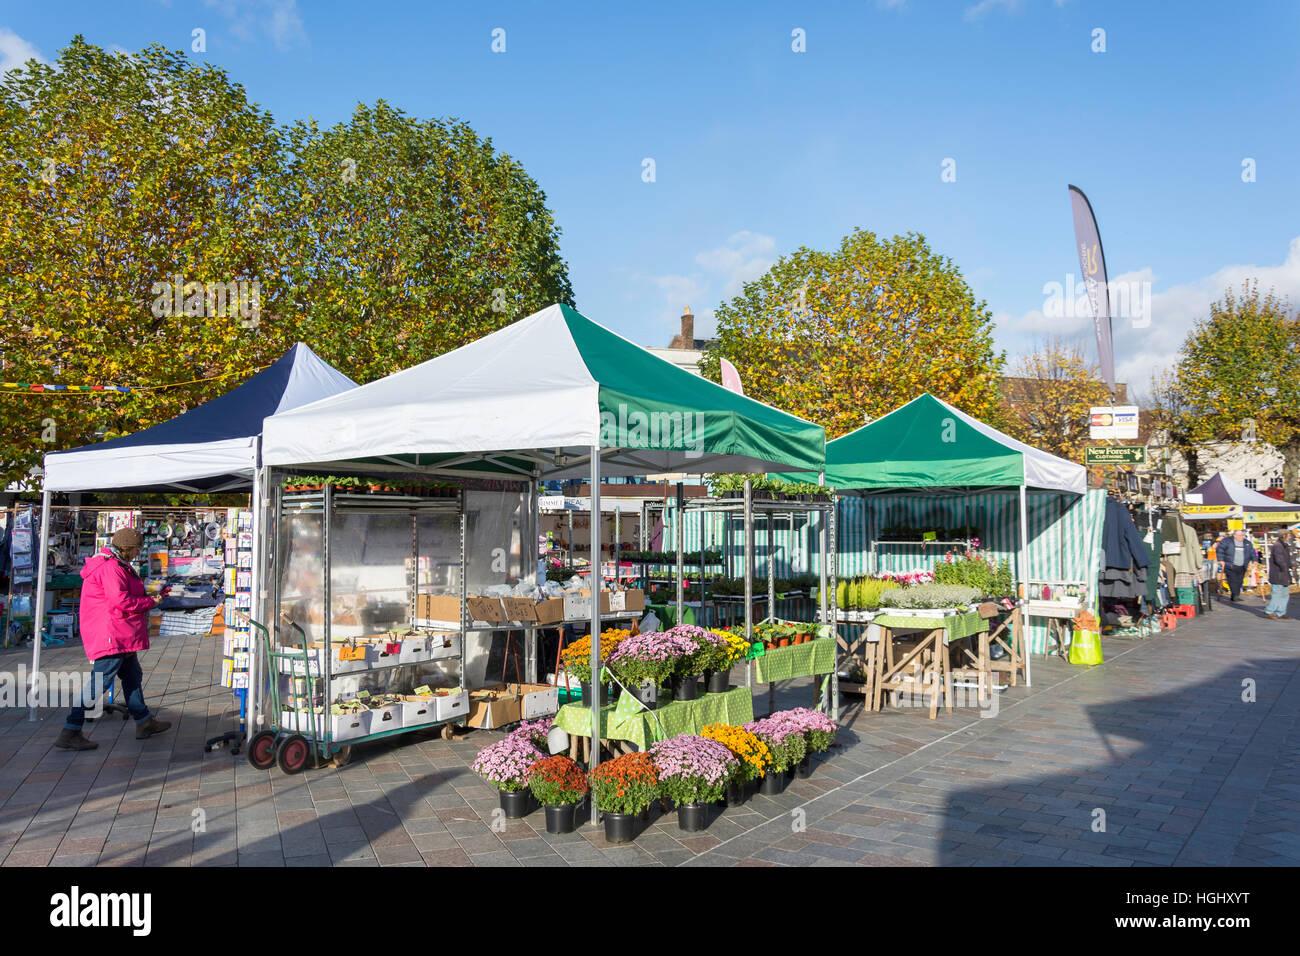 Flower and plant stalls, Salisbury Charter Market, Market Place, Salisbury, Wiltshire, England, United Kingdom - Stock Image